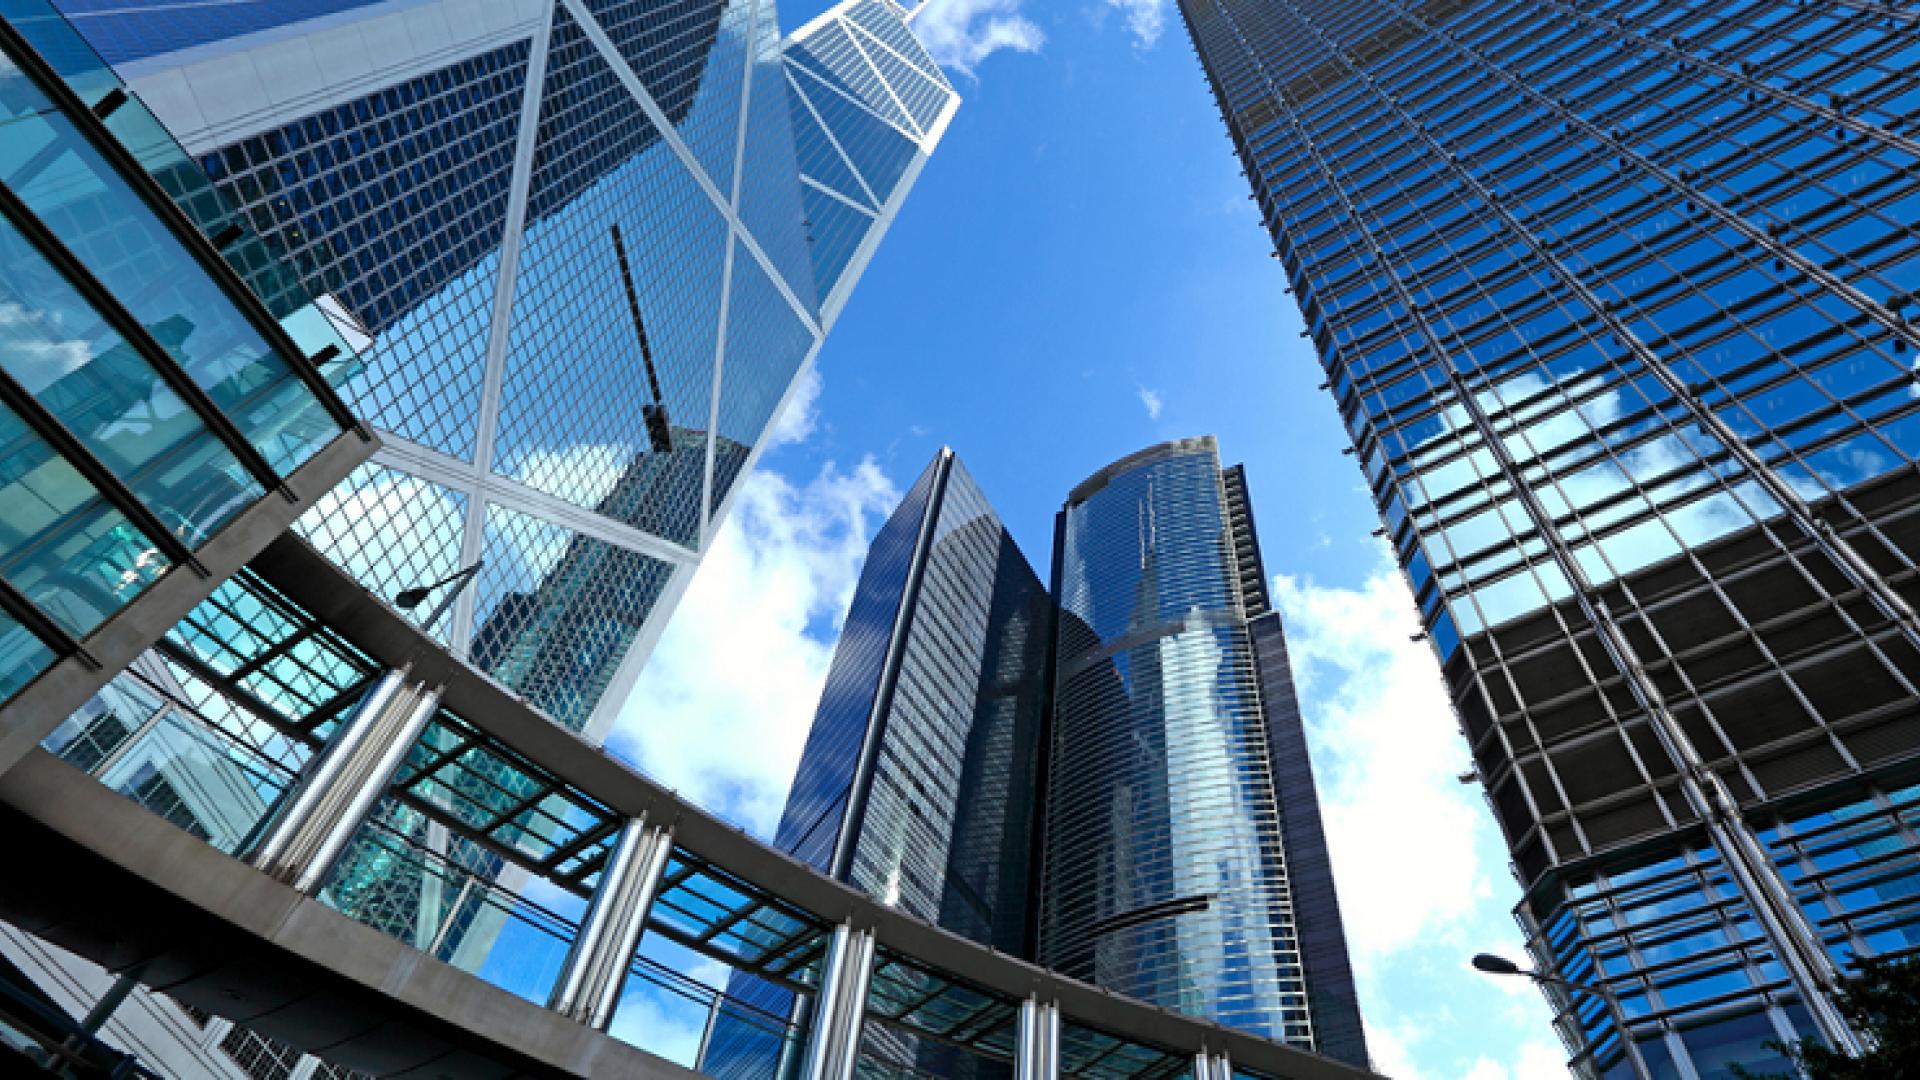 Commercial-property-survey-740x530